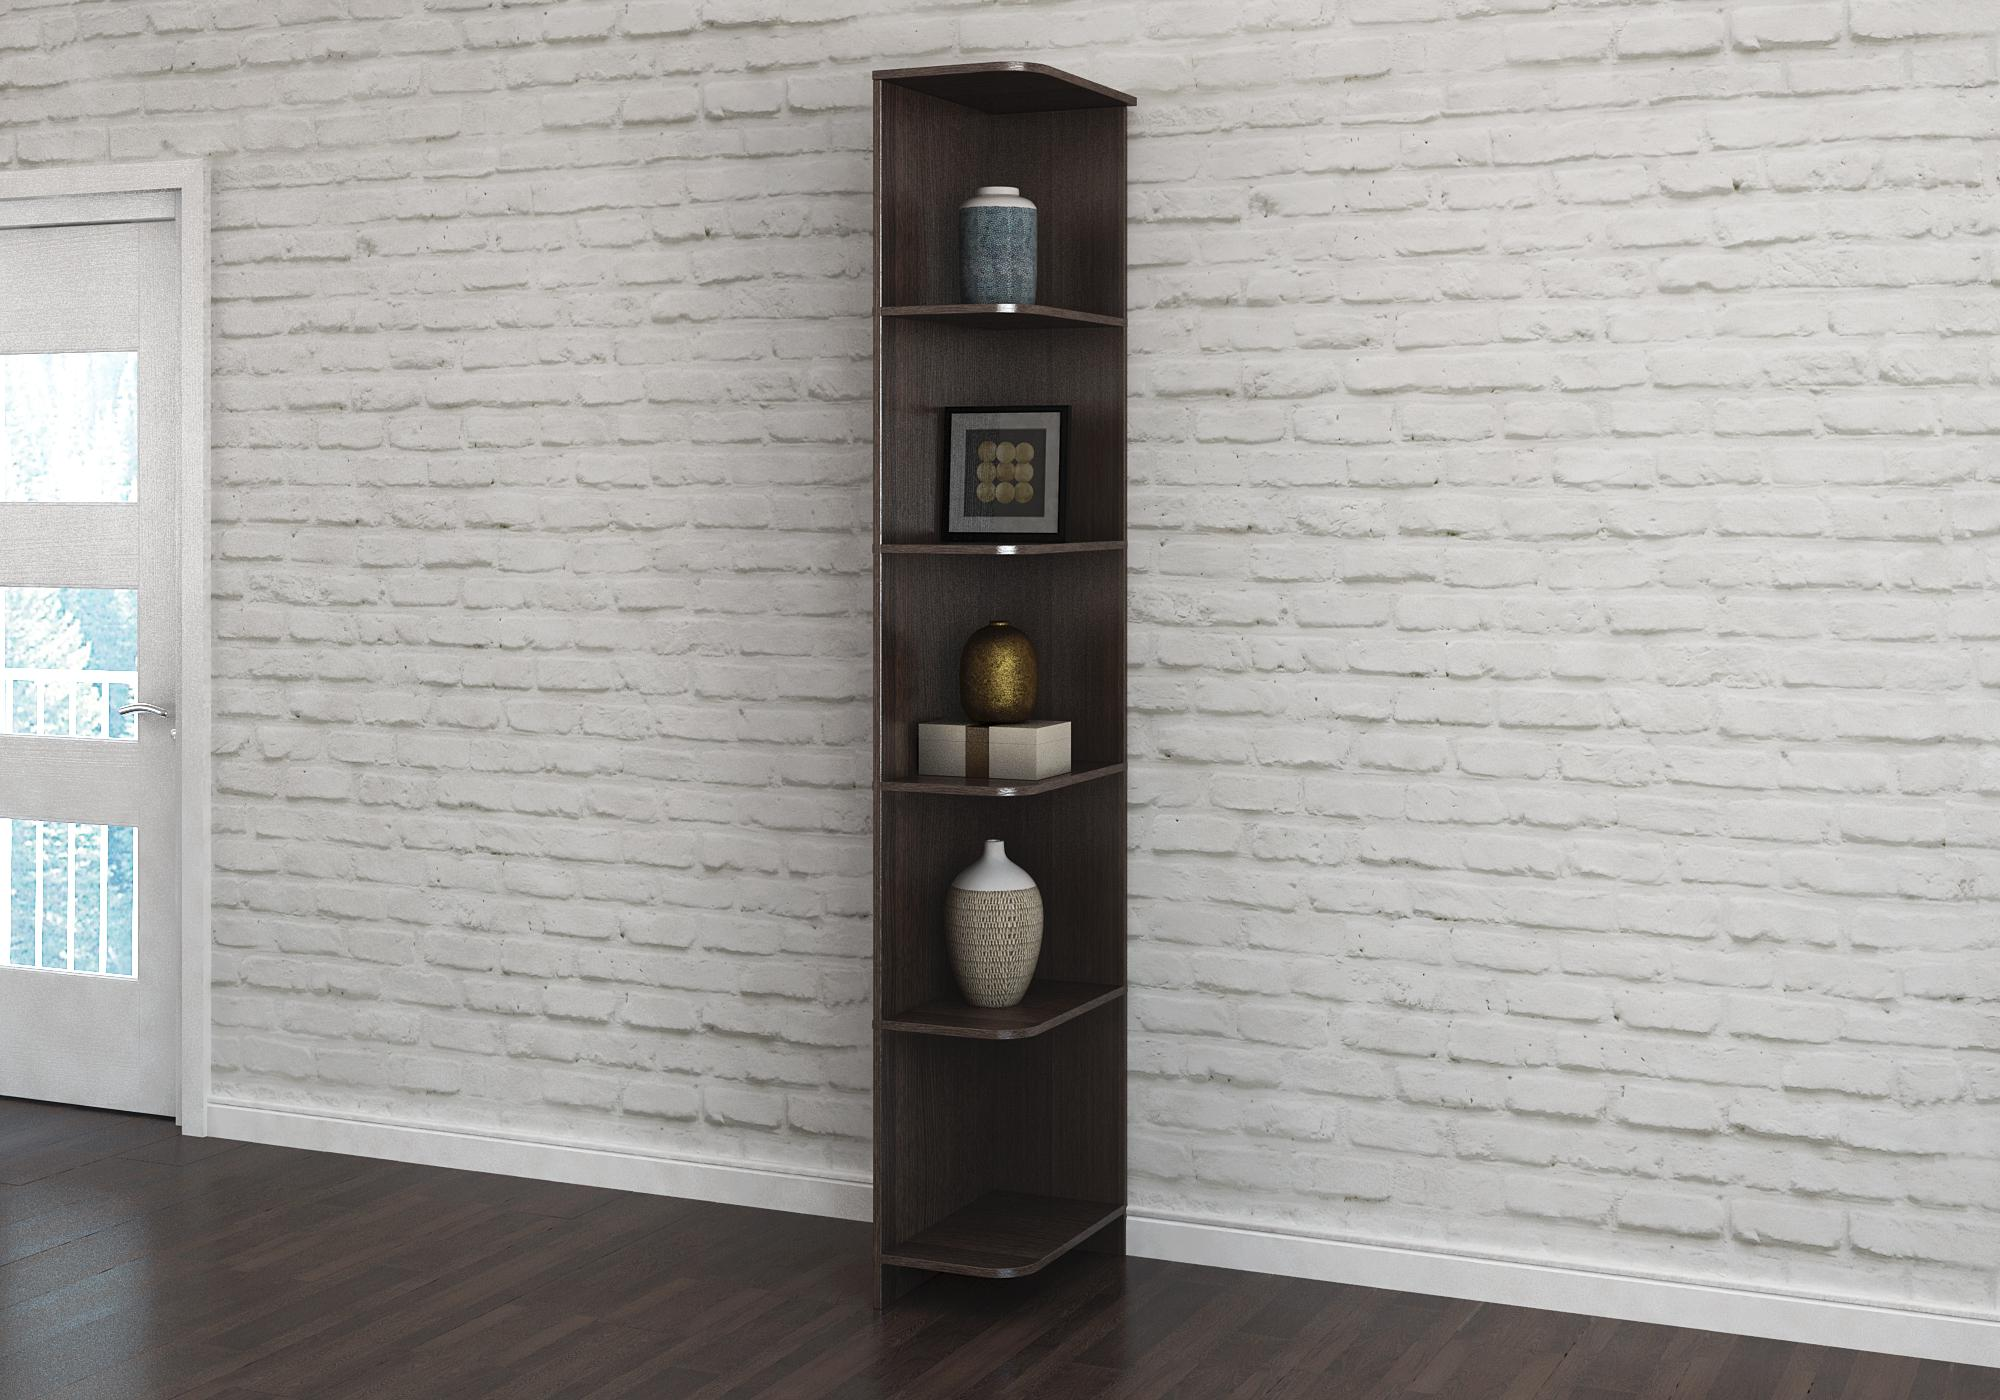 Продажа мебели в интернет-магазине ВашаКомната.РФ – фото 1.21